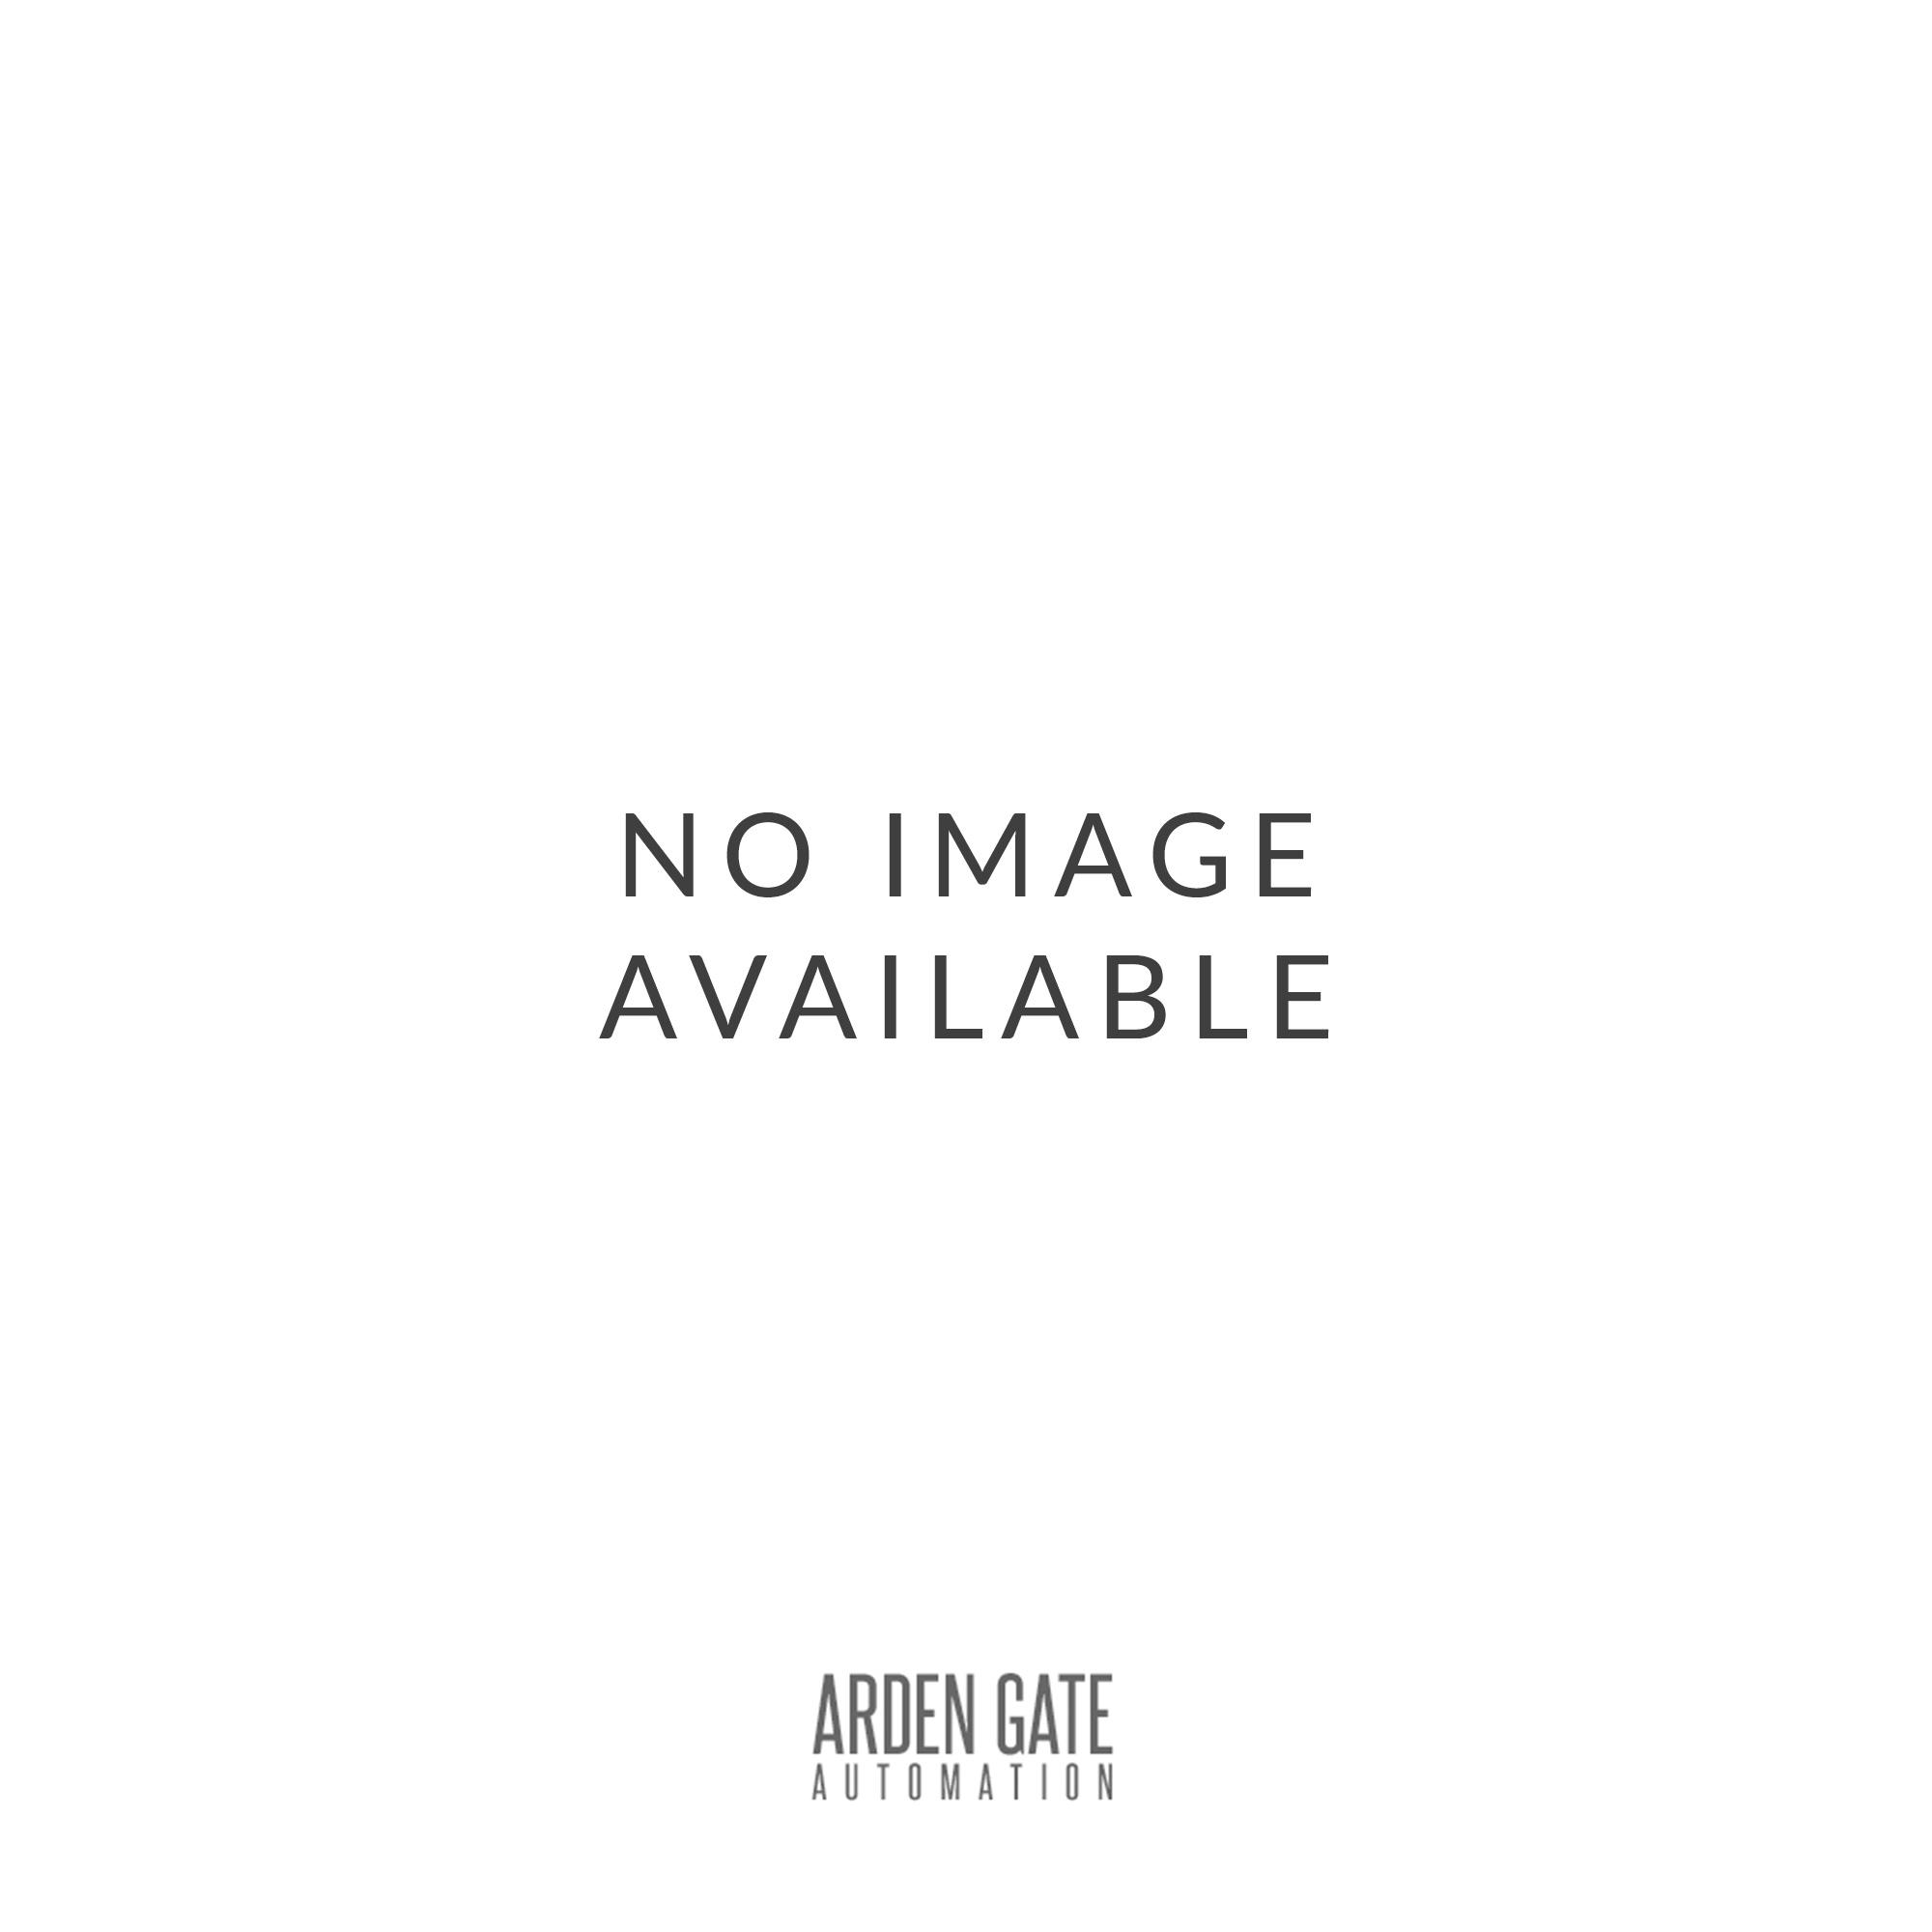 CDVI BIOSYS Biometric Reader